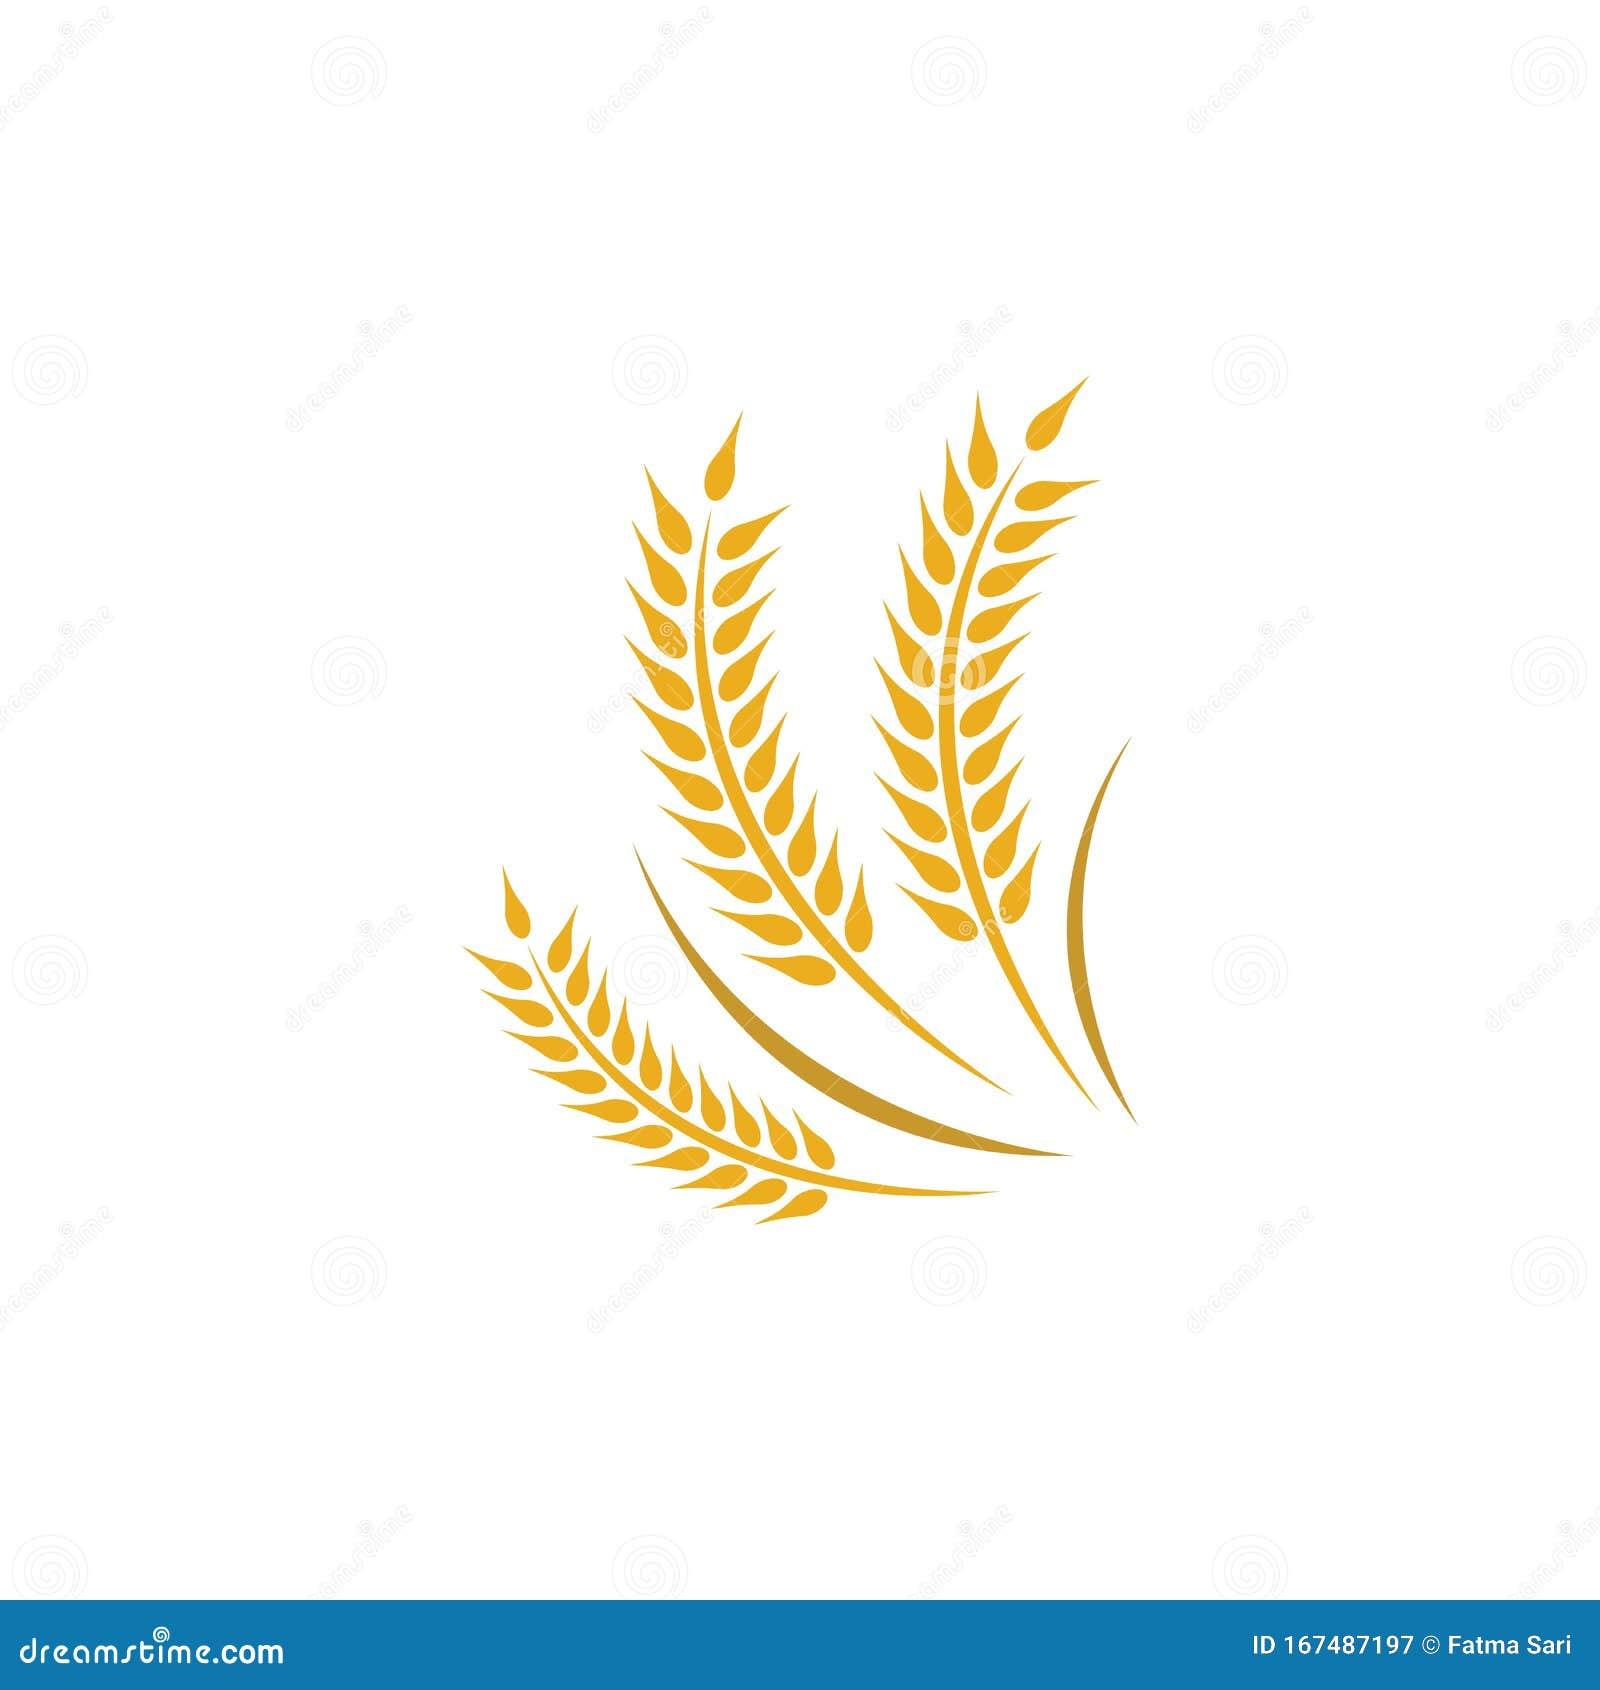 Wheat vector icon stock vector. Illustration of wheat ...